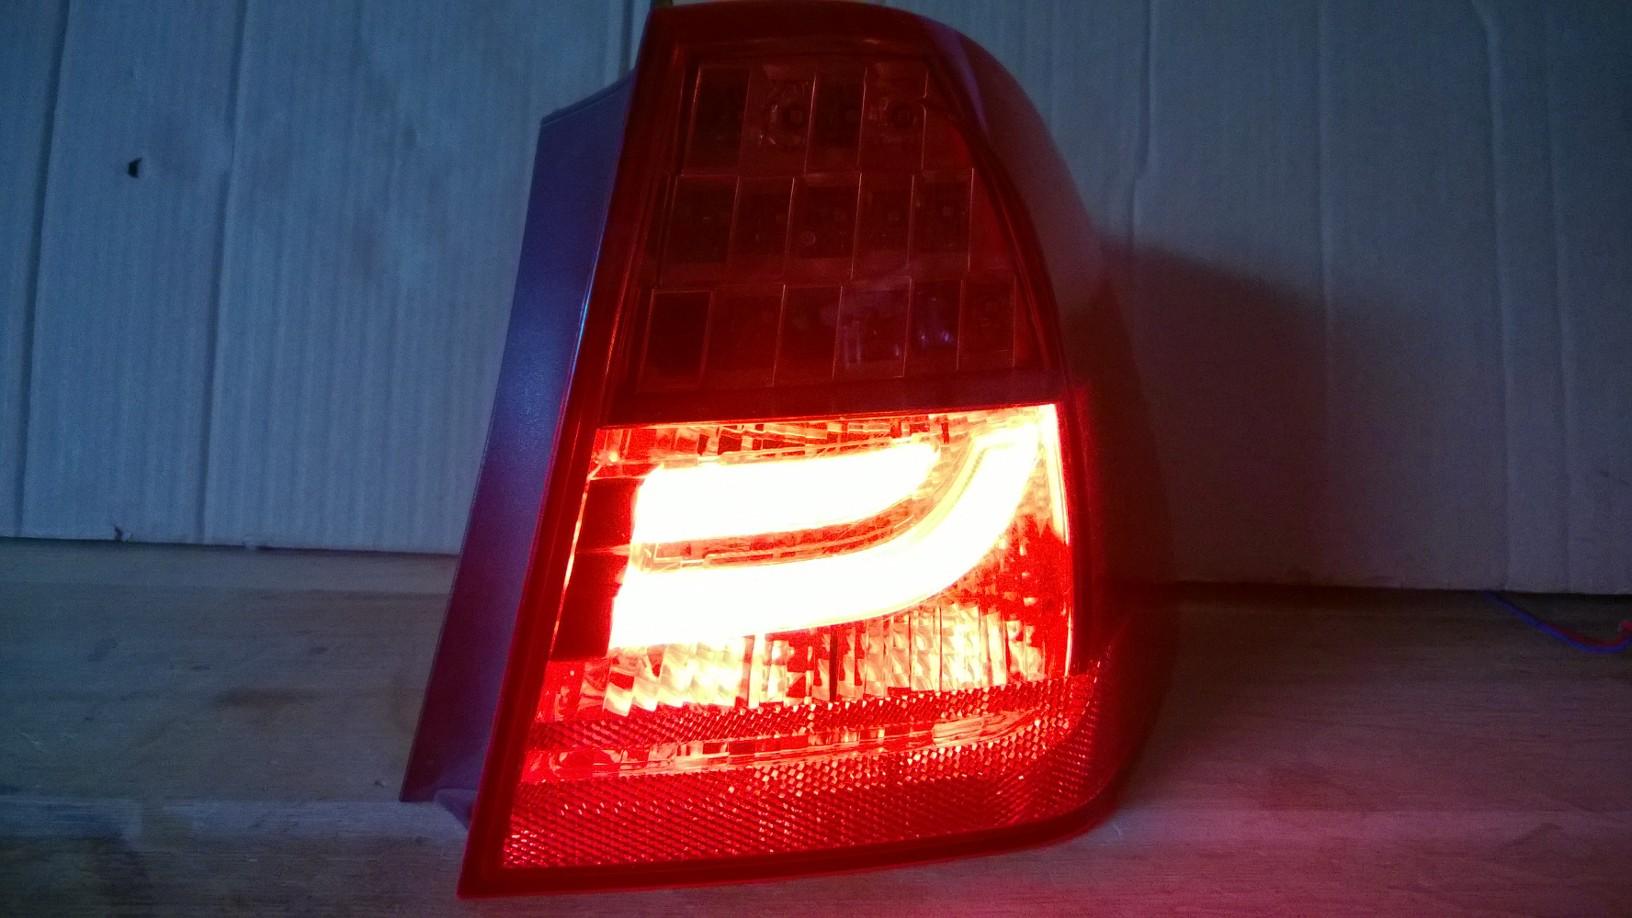 Reparatur von lampen tylnych bmw serii 3 e90 lift for Lampen reparatur